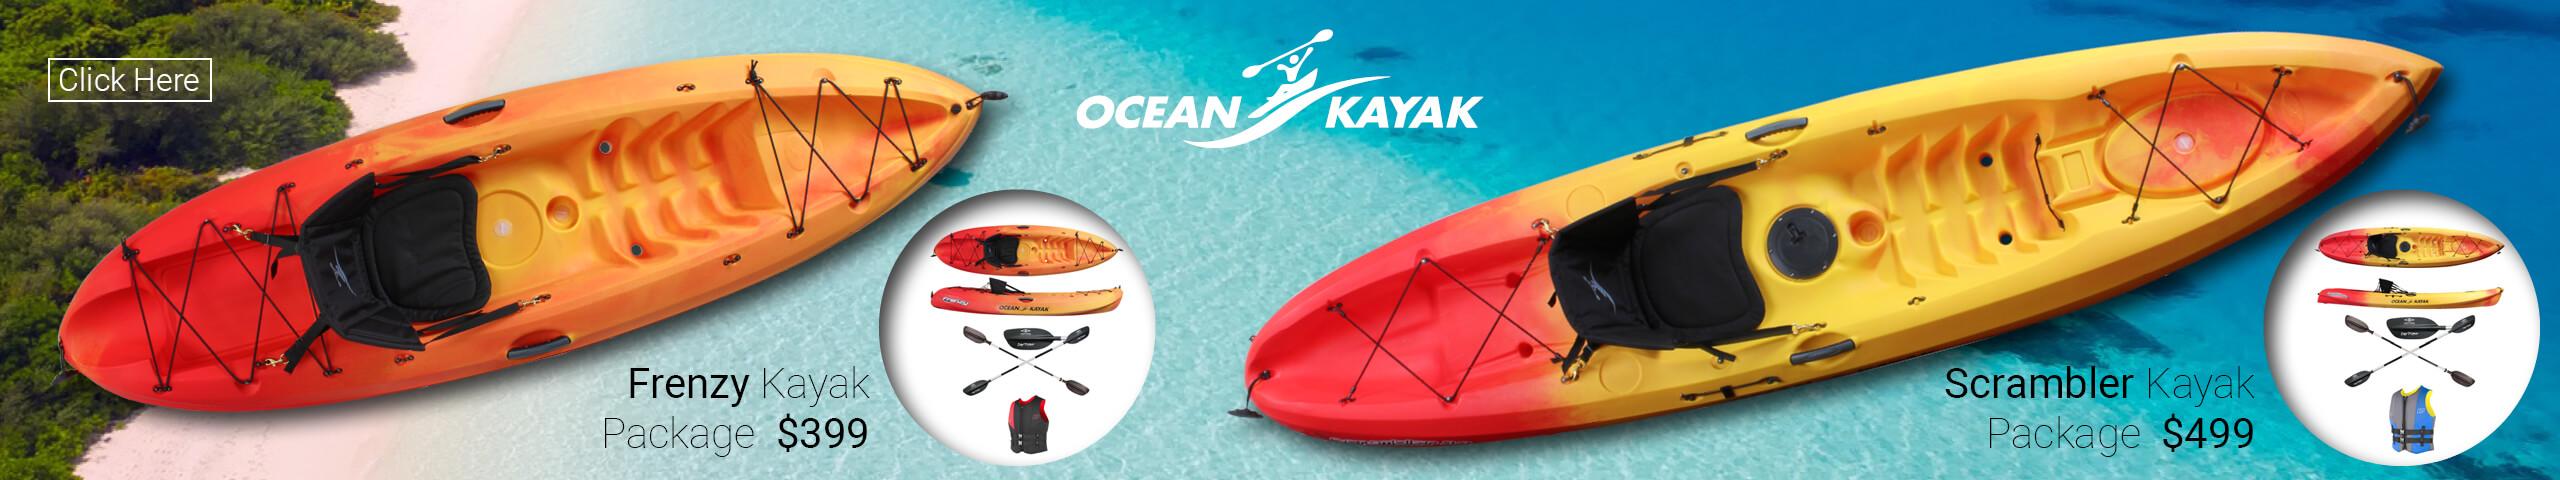 Frenzy Kayak and Scrambler Kayak Package - Ocean Kayak For Sales